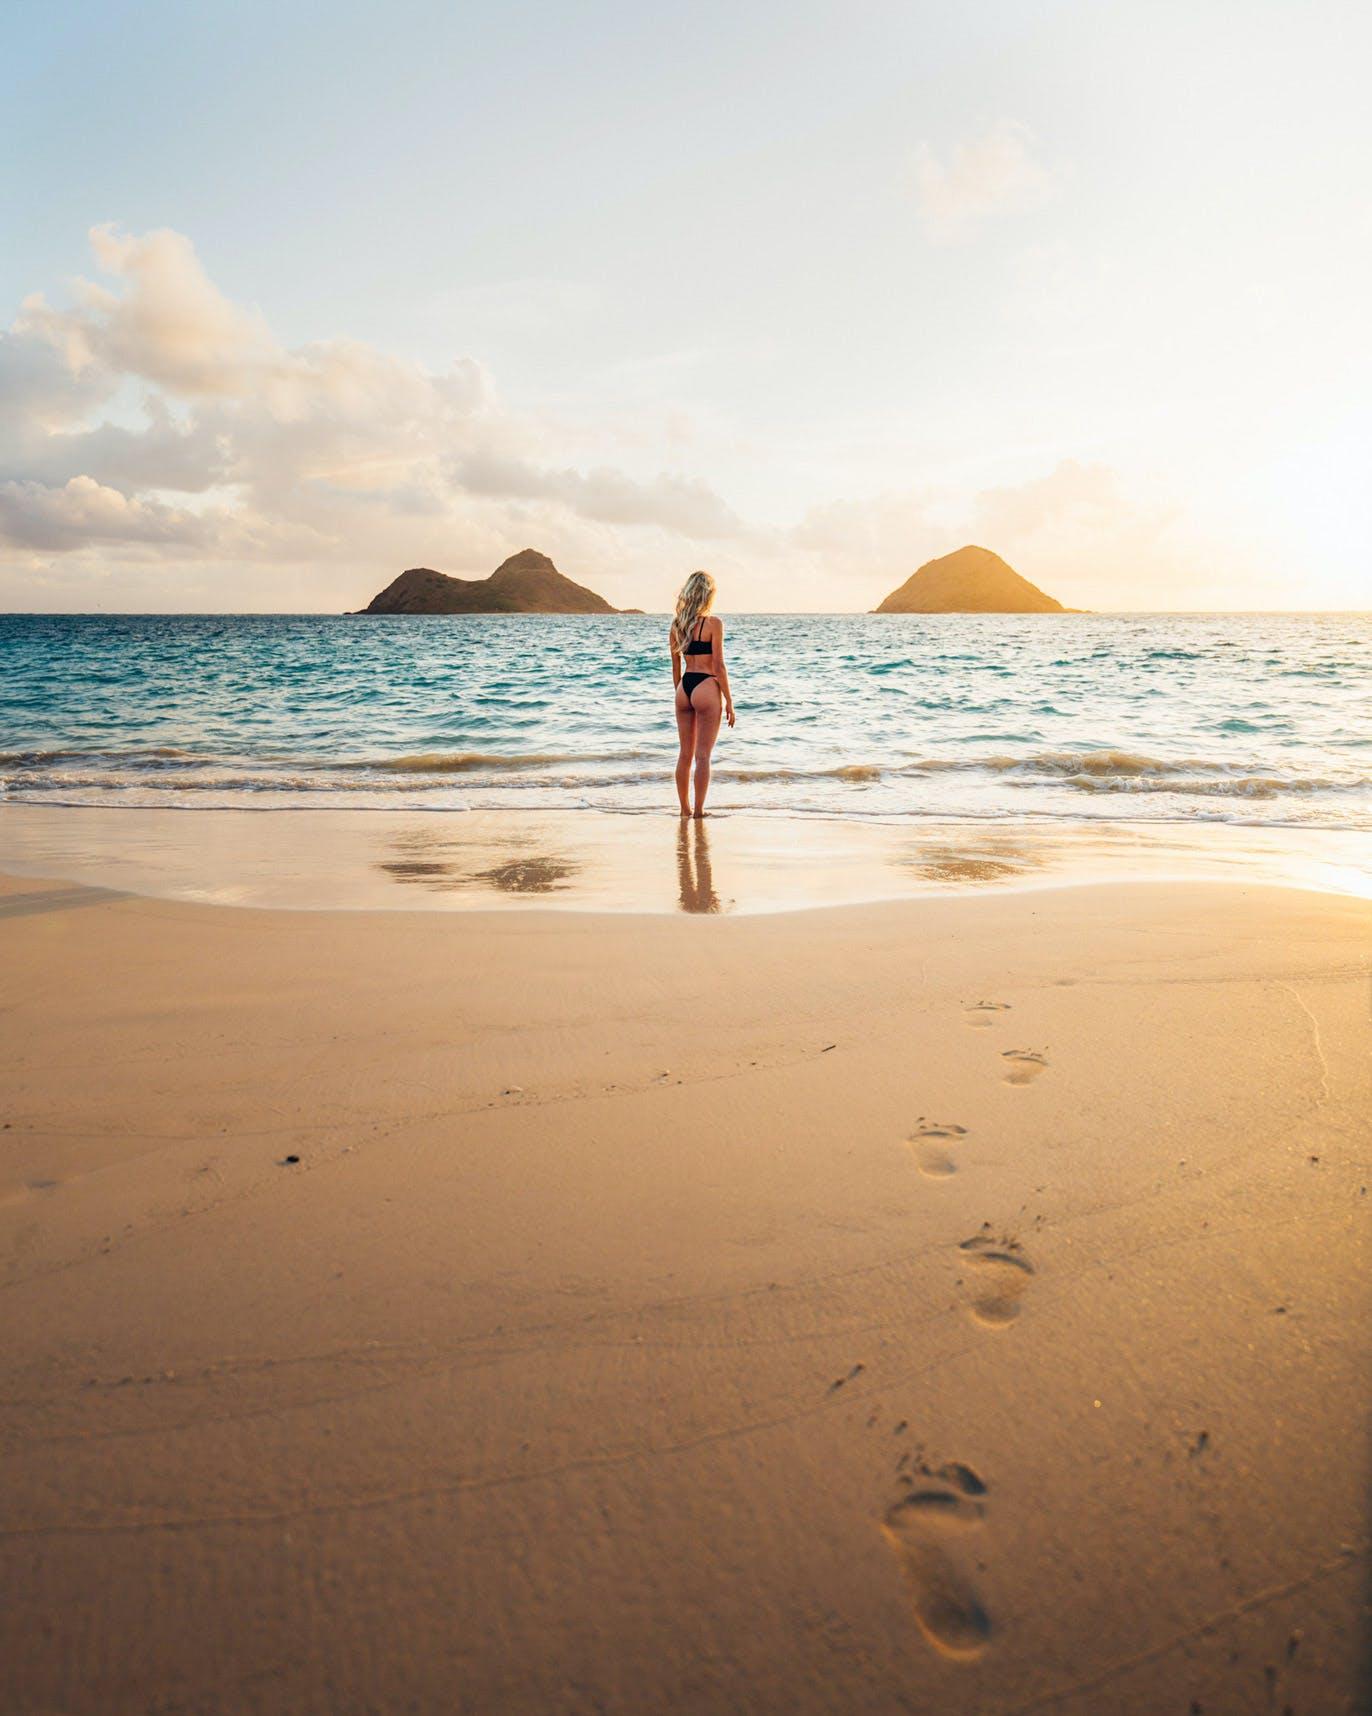 """Ocean Access 10"" on Lanikai Beach view of Moku Nui & Moku Iki with Model"